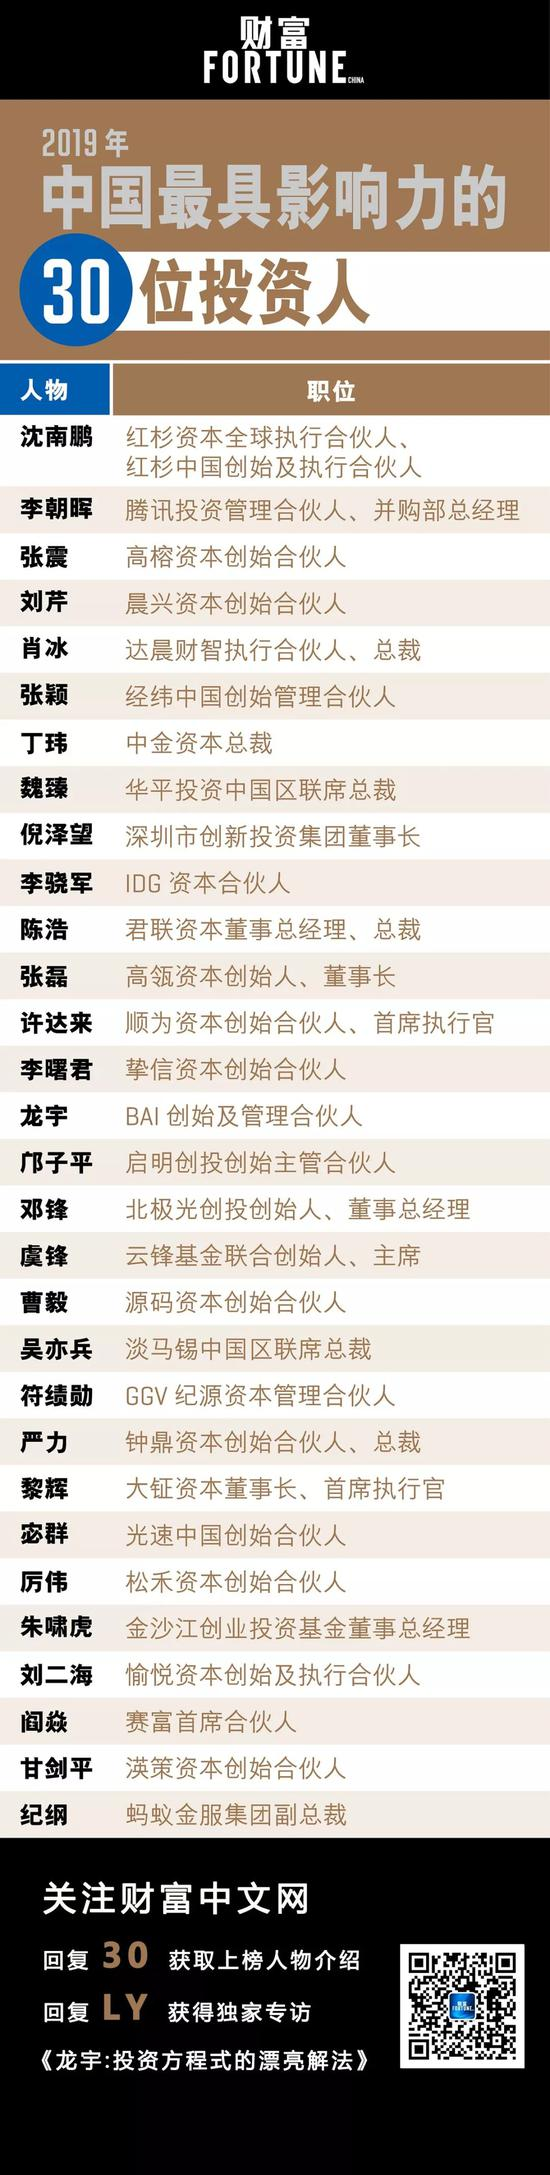 cc娱乐开了多久_金石亚药聘任魏宝康为总经理 曾在上海现代制药担任总经理